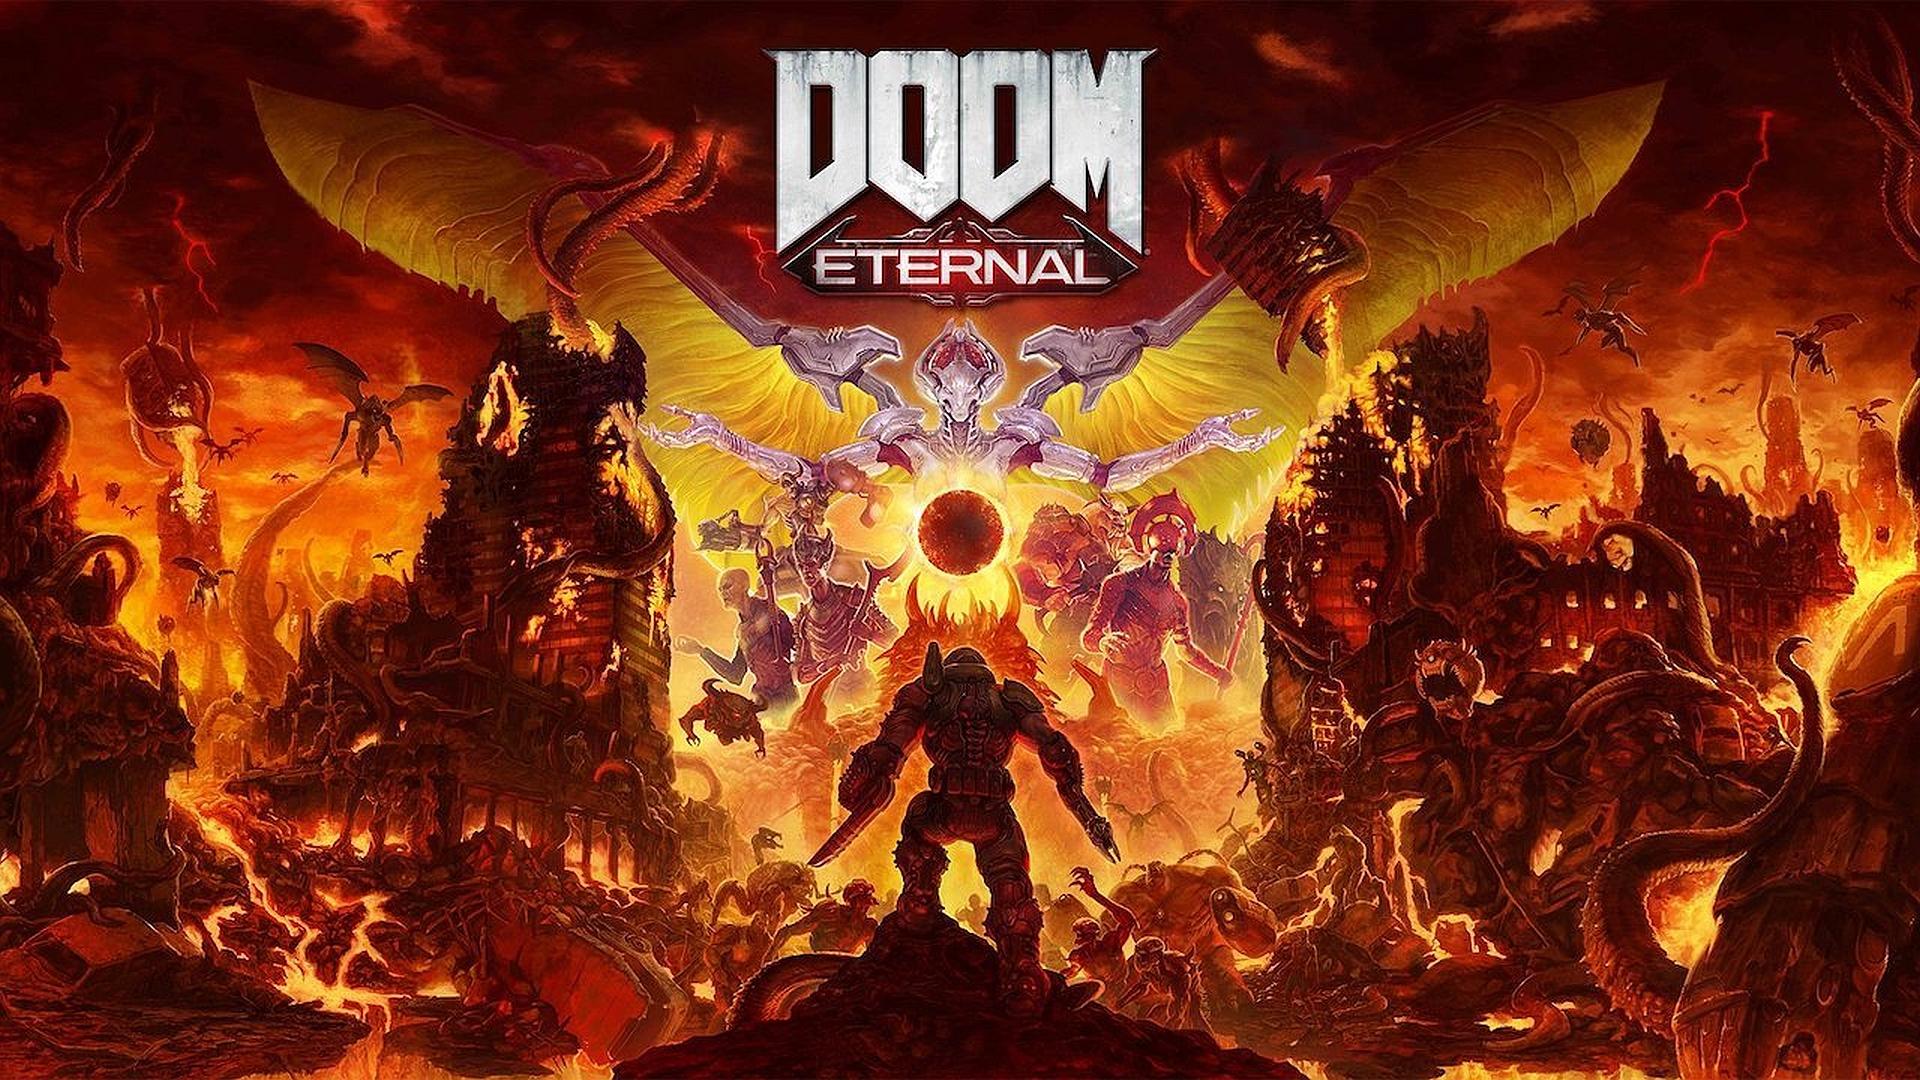 Nuevo tráiler de Doom Eternal